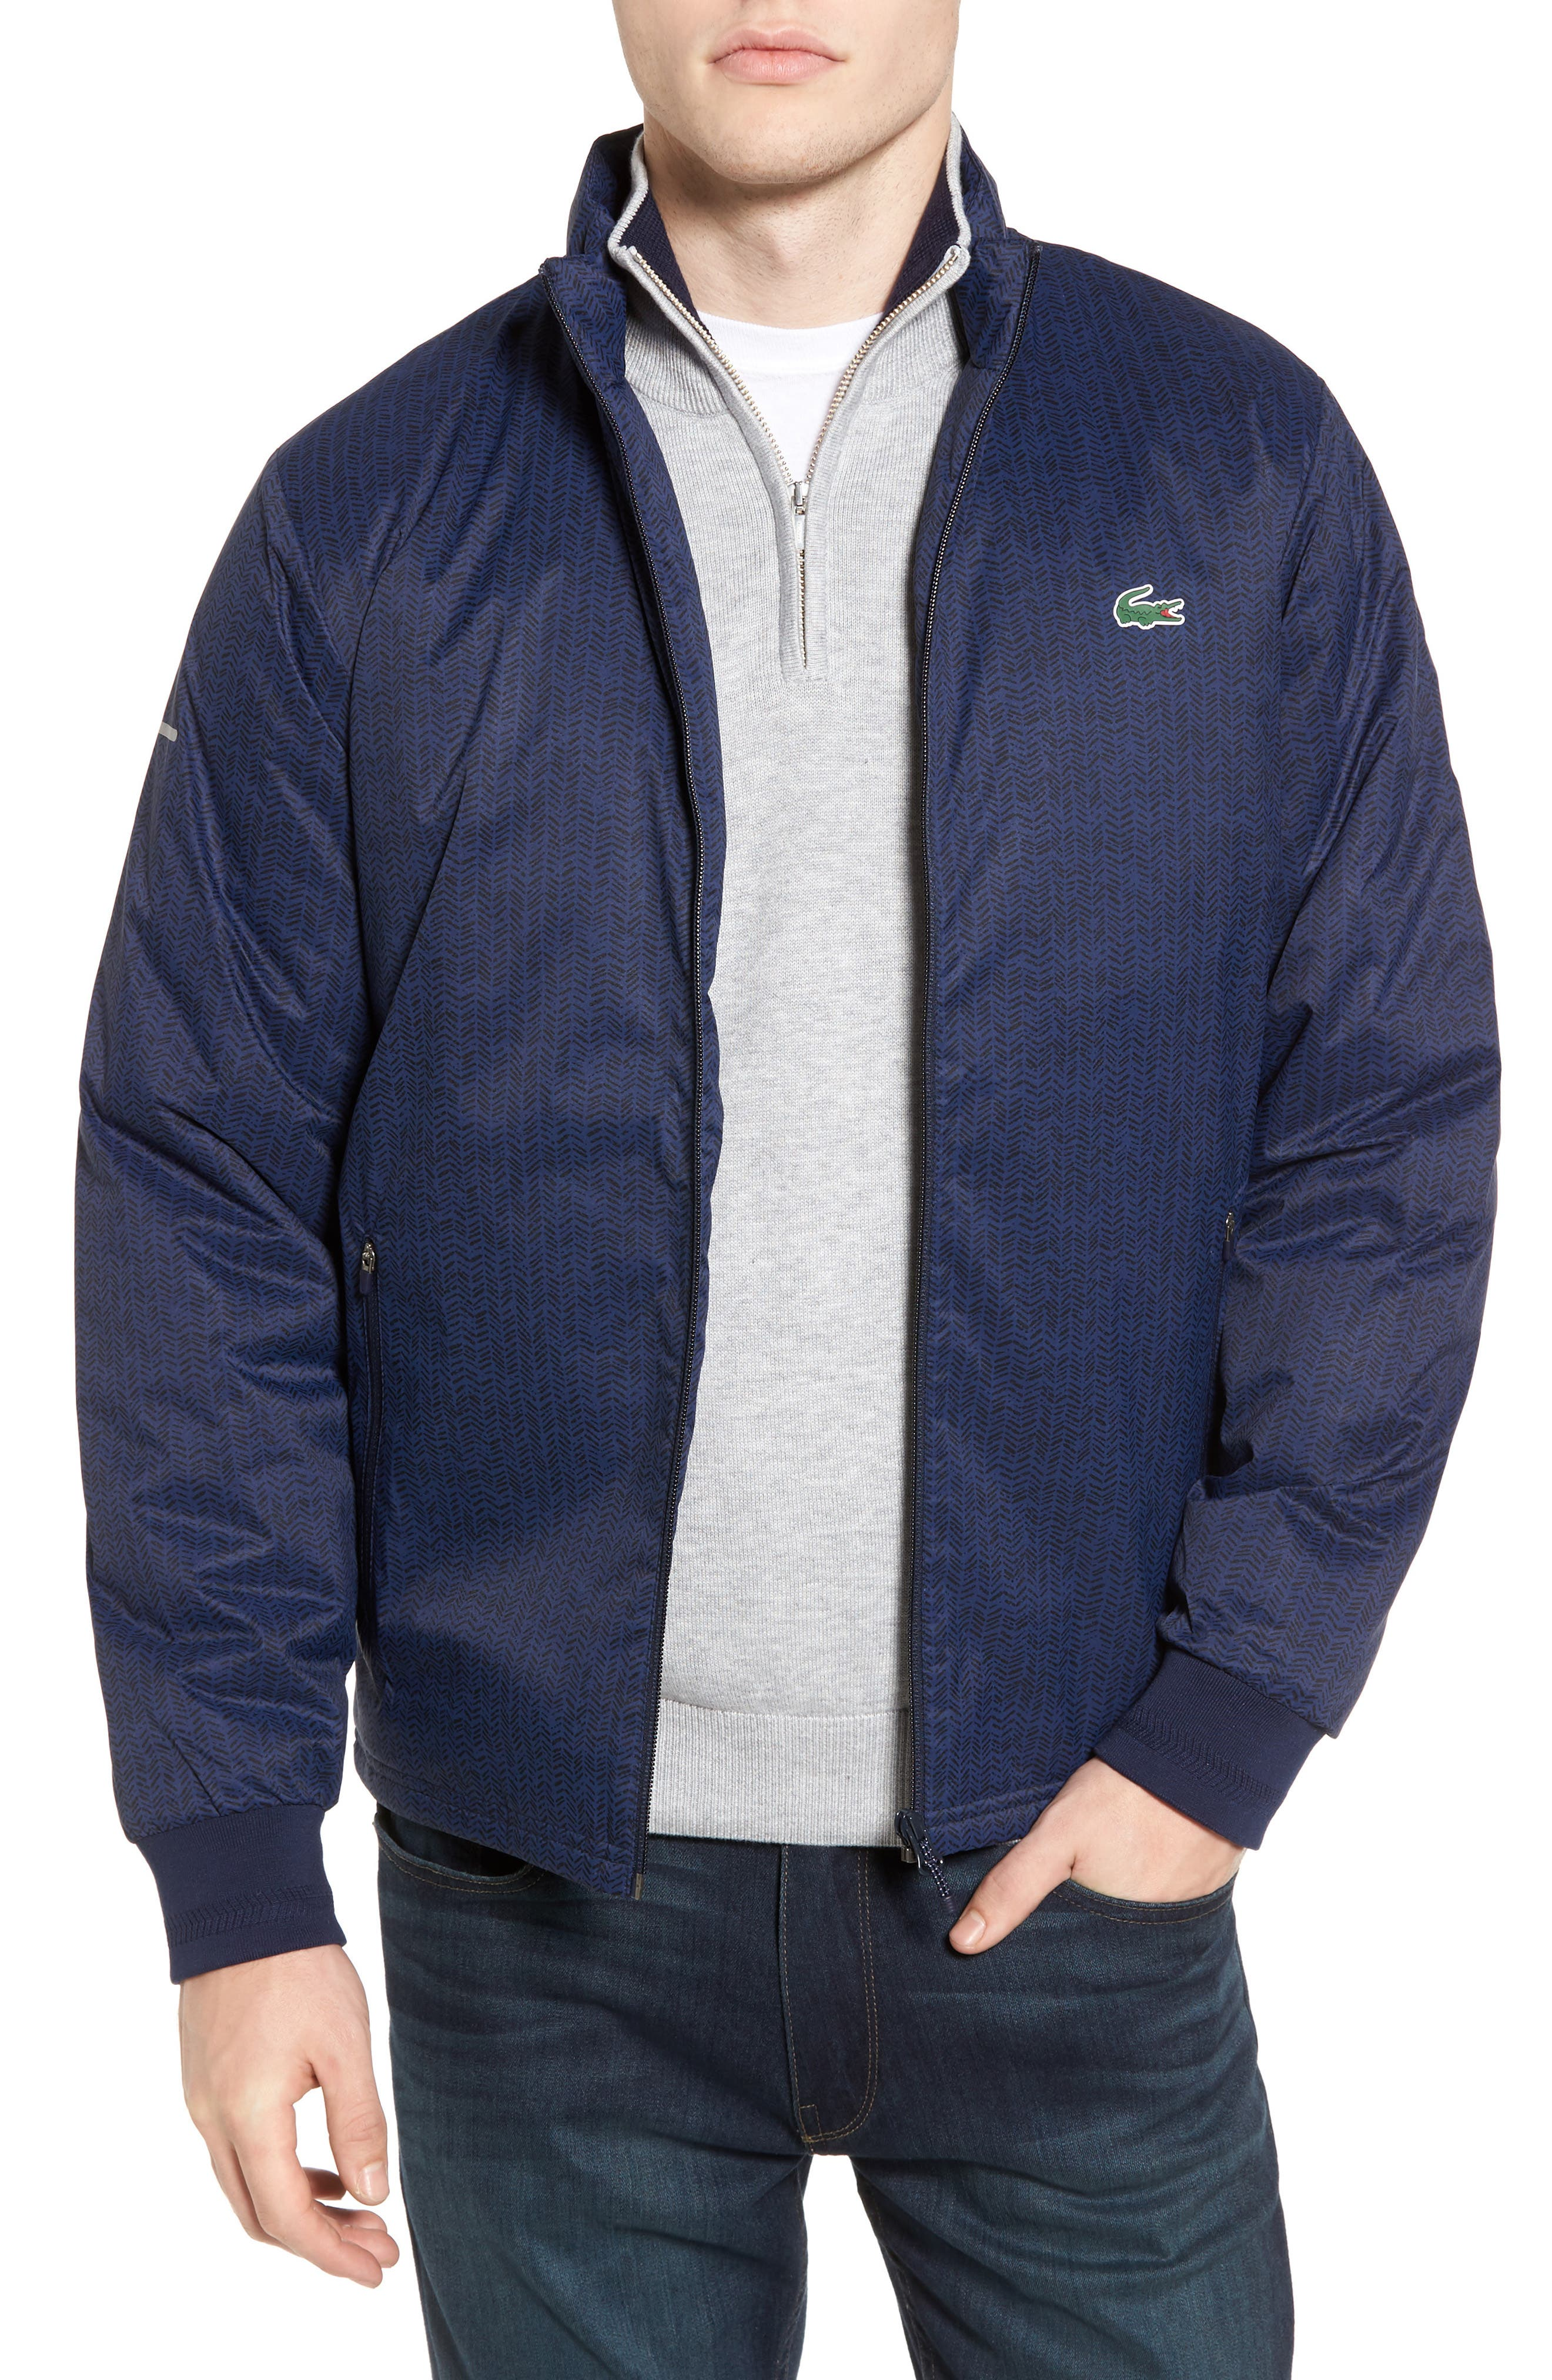 Herringbone Zip-Up Jacket,                             Main thumbnail 1, color,                             Navy Blue/ Navy Blue